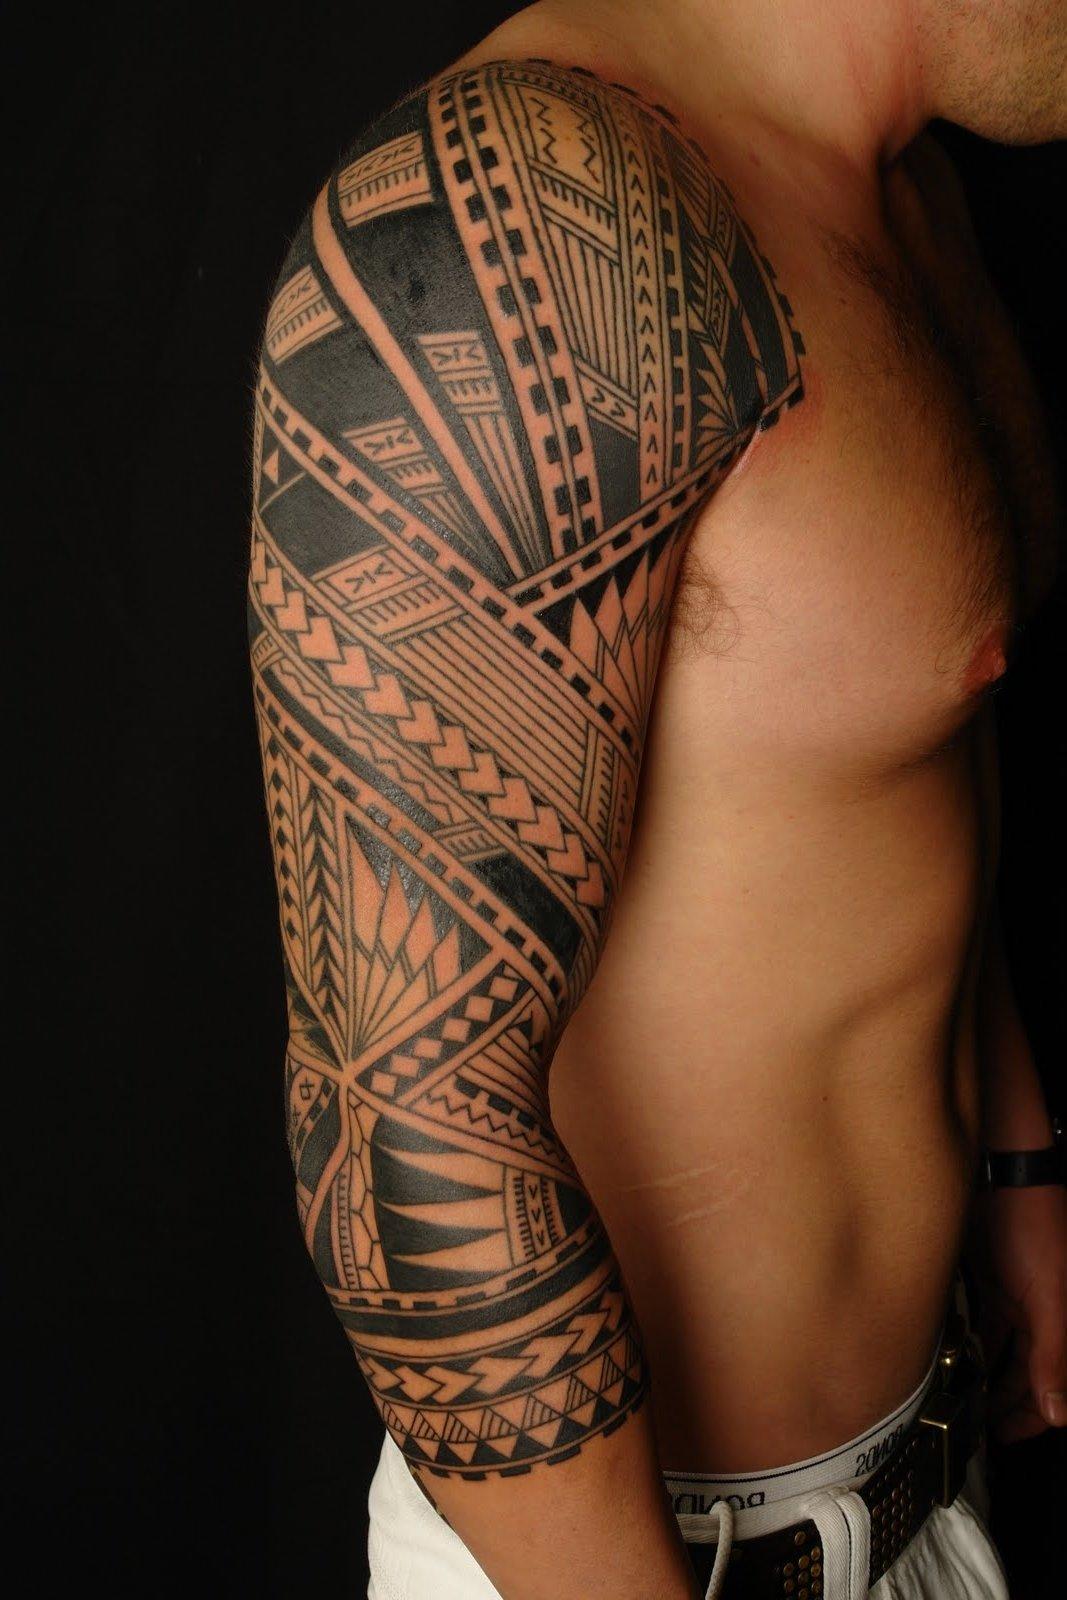 10 Famous Tattoo Sleeve Ideas For Black Men tattoo sleeve ideas for black men cool images tattoo sleeve design 2020